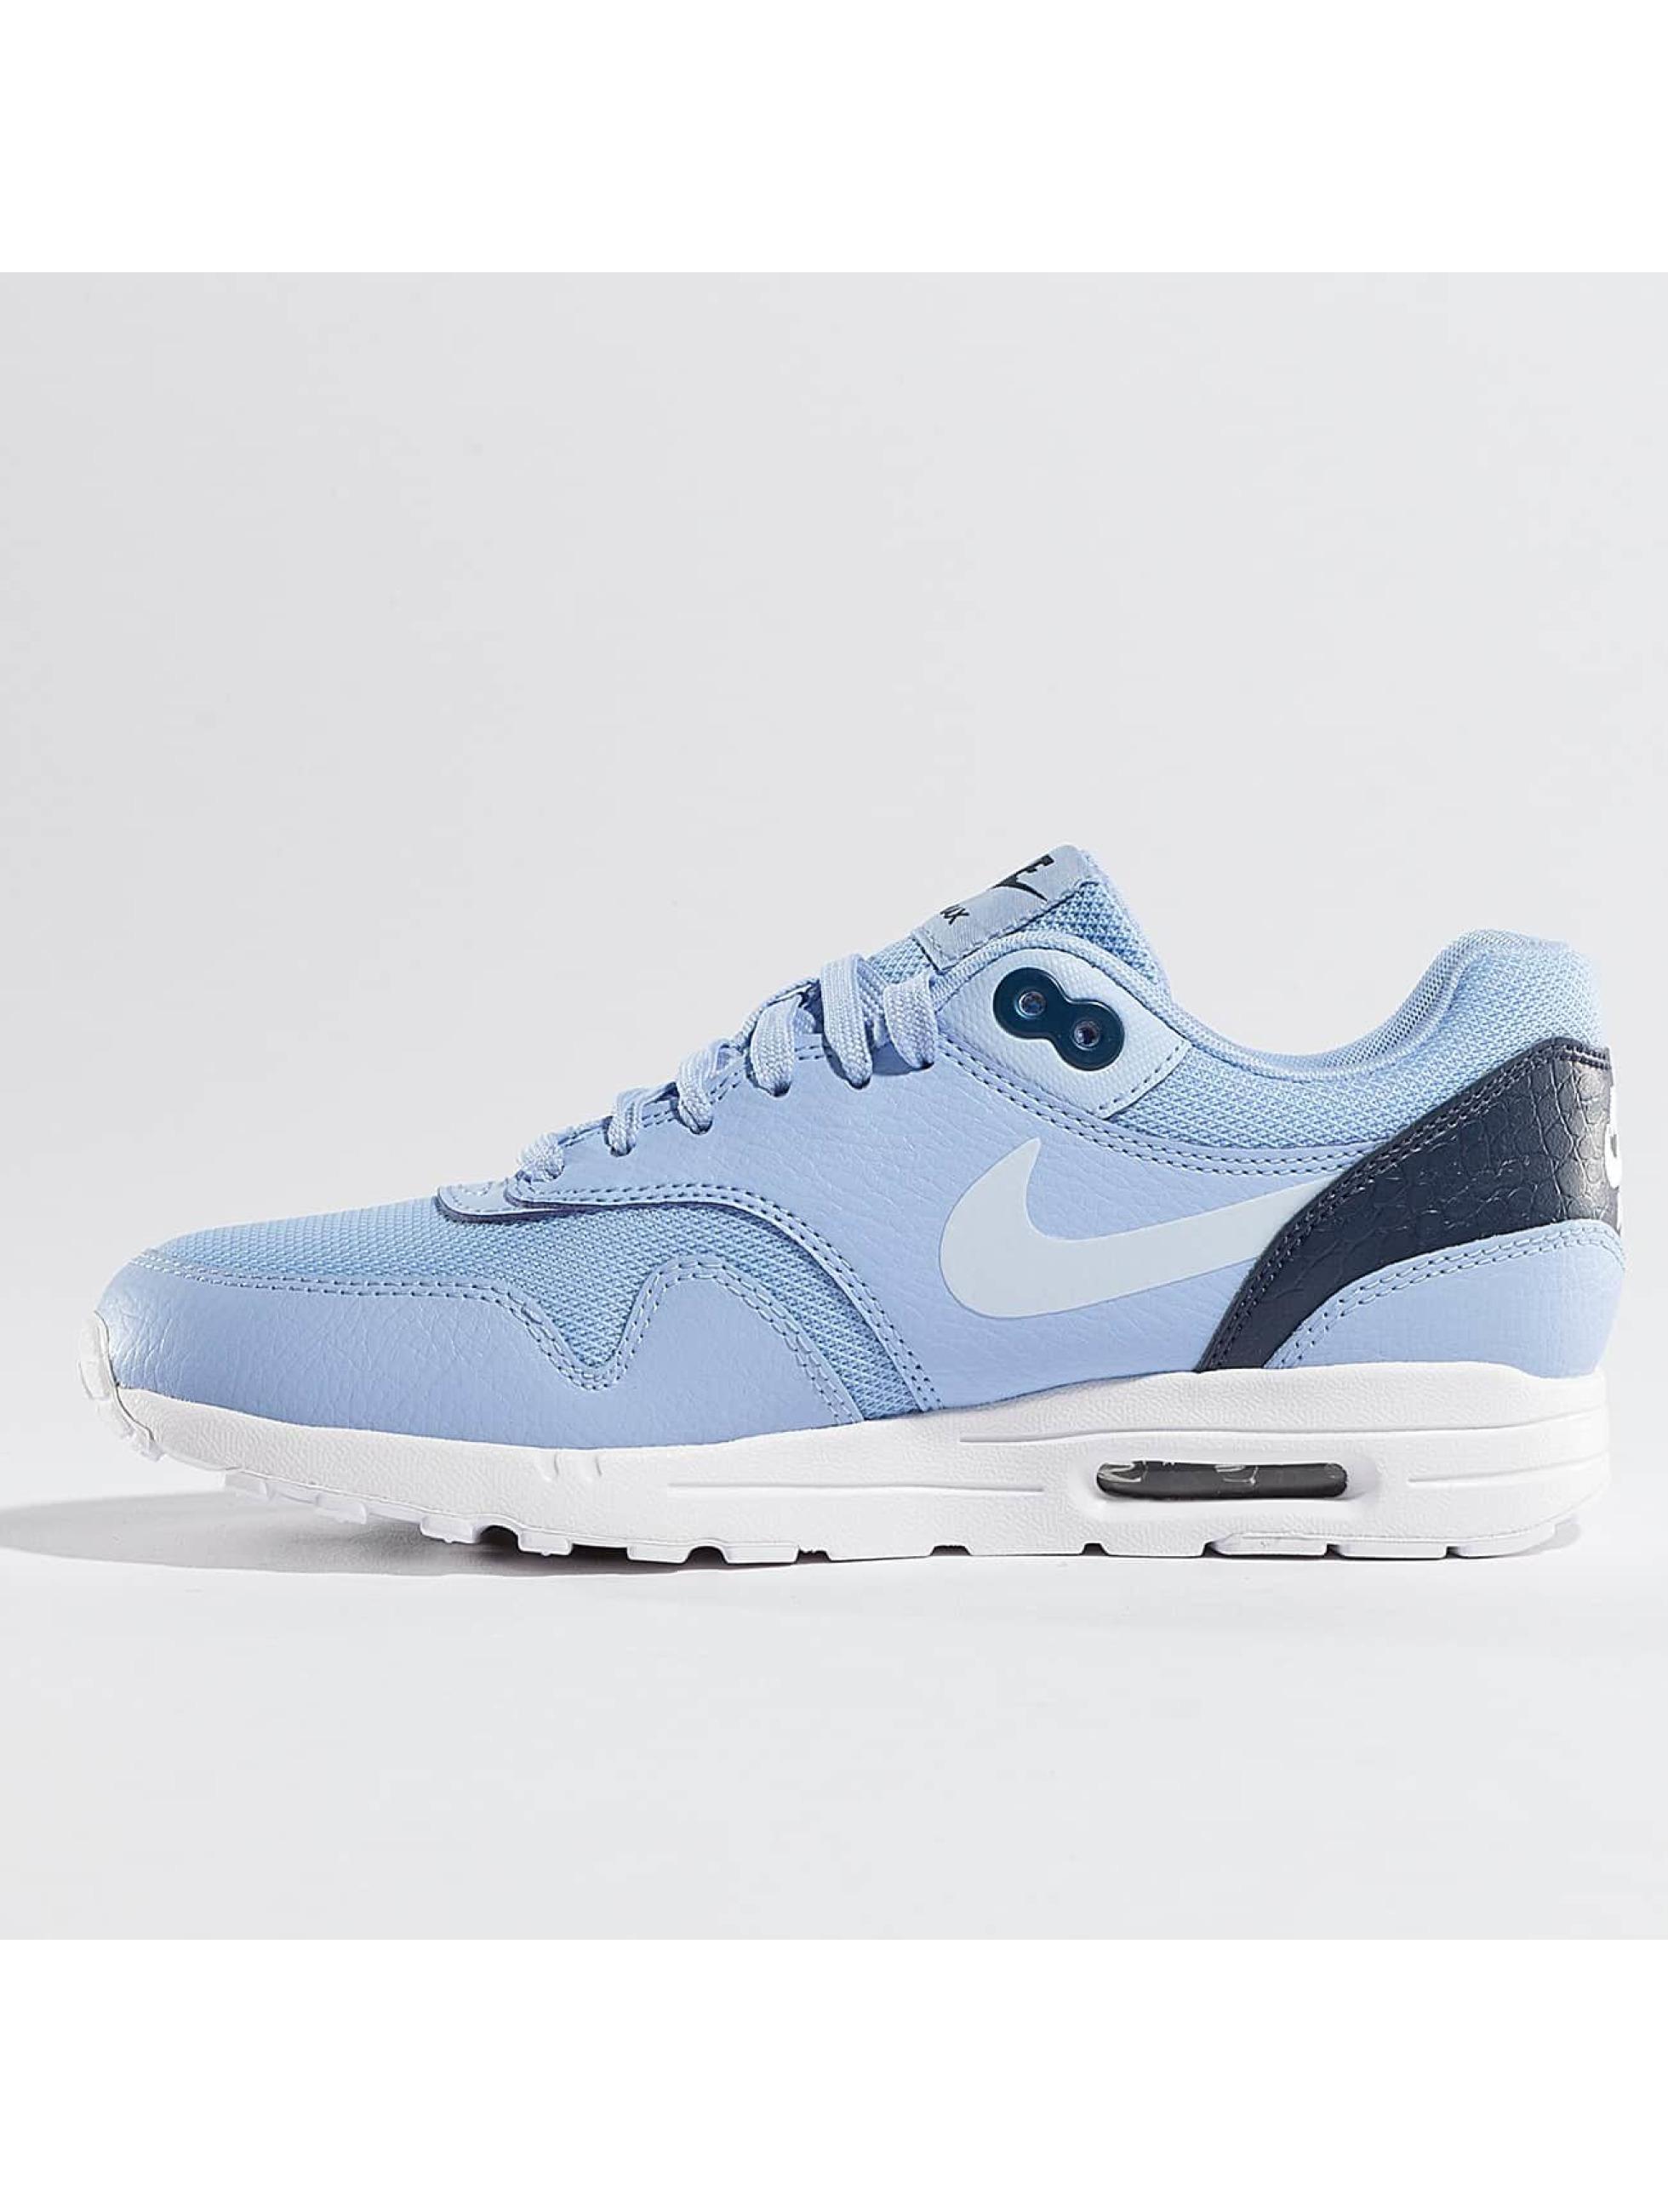 Nike Sneakers Women's Air Max 1 Ultra 2.0 modrá